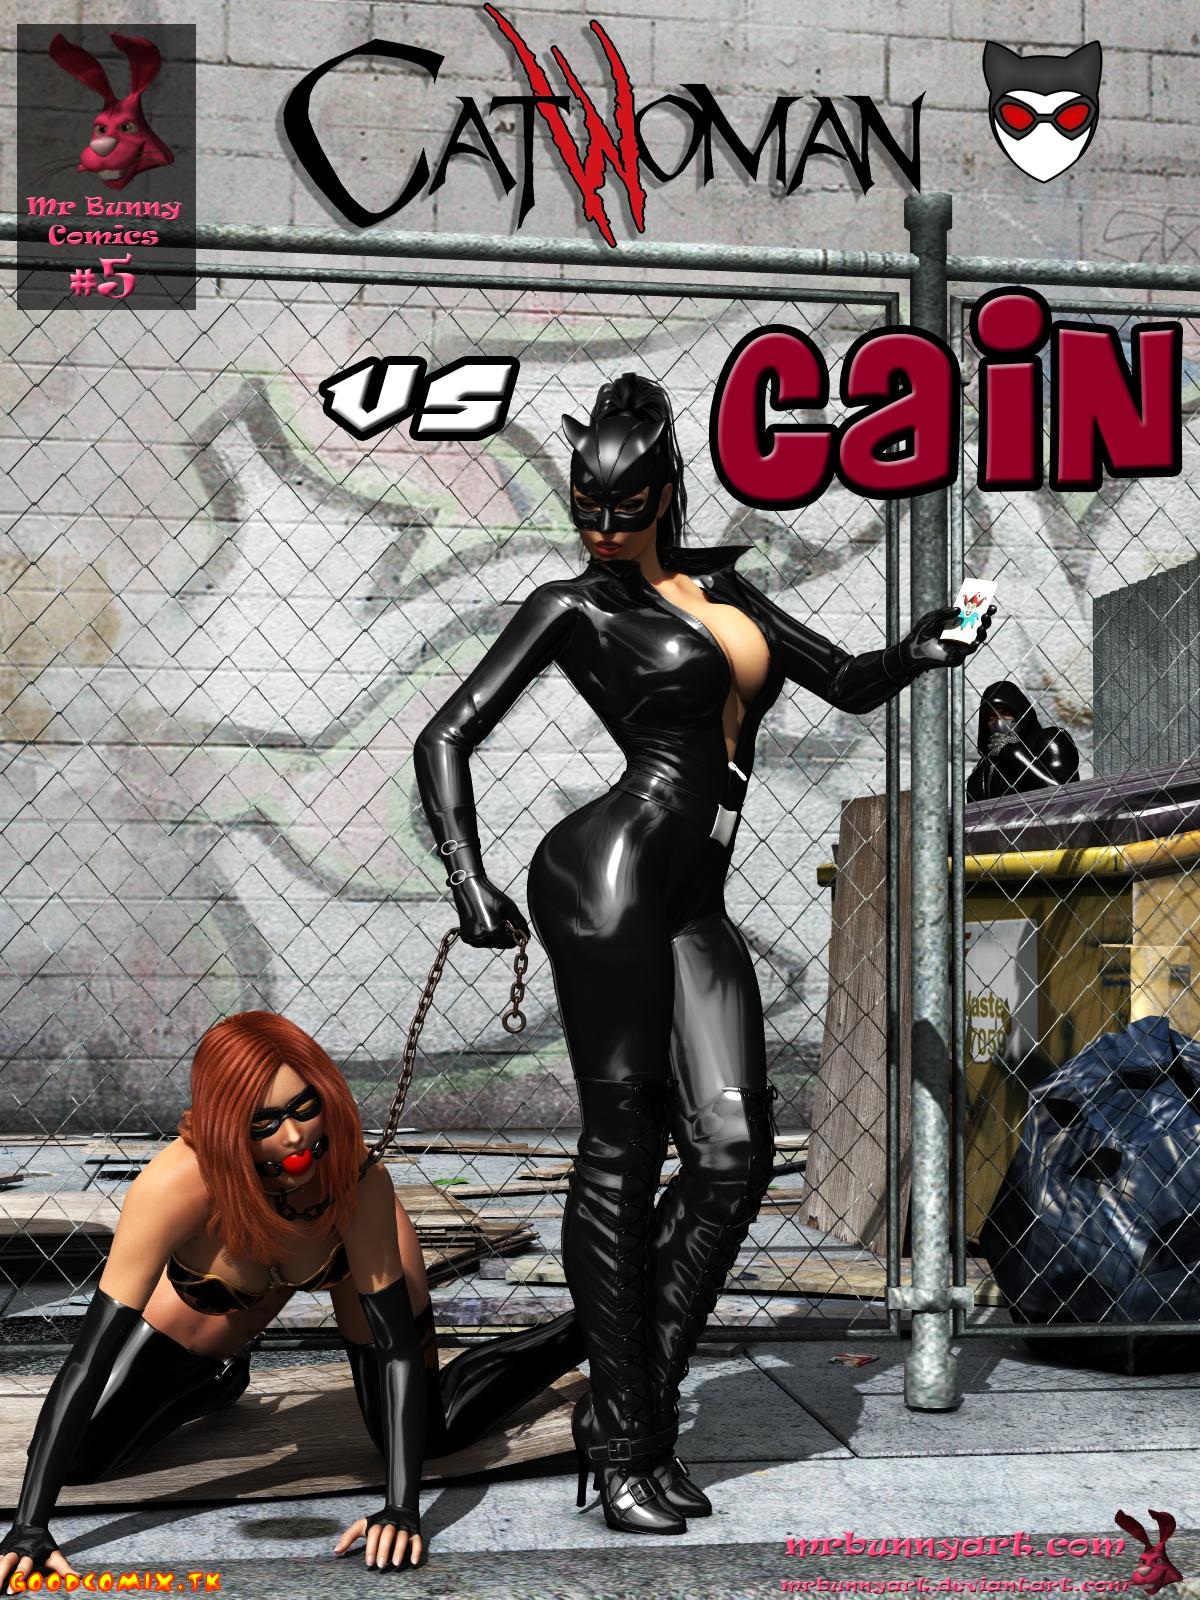 Goodcomix.tk Batman - [MrBunnyArt] - Catwoman vs Cain